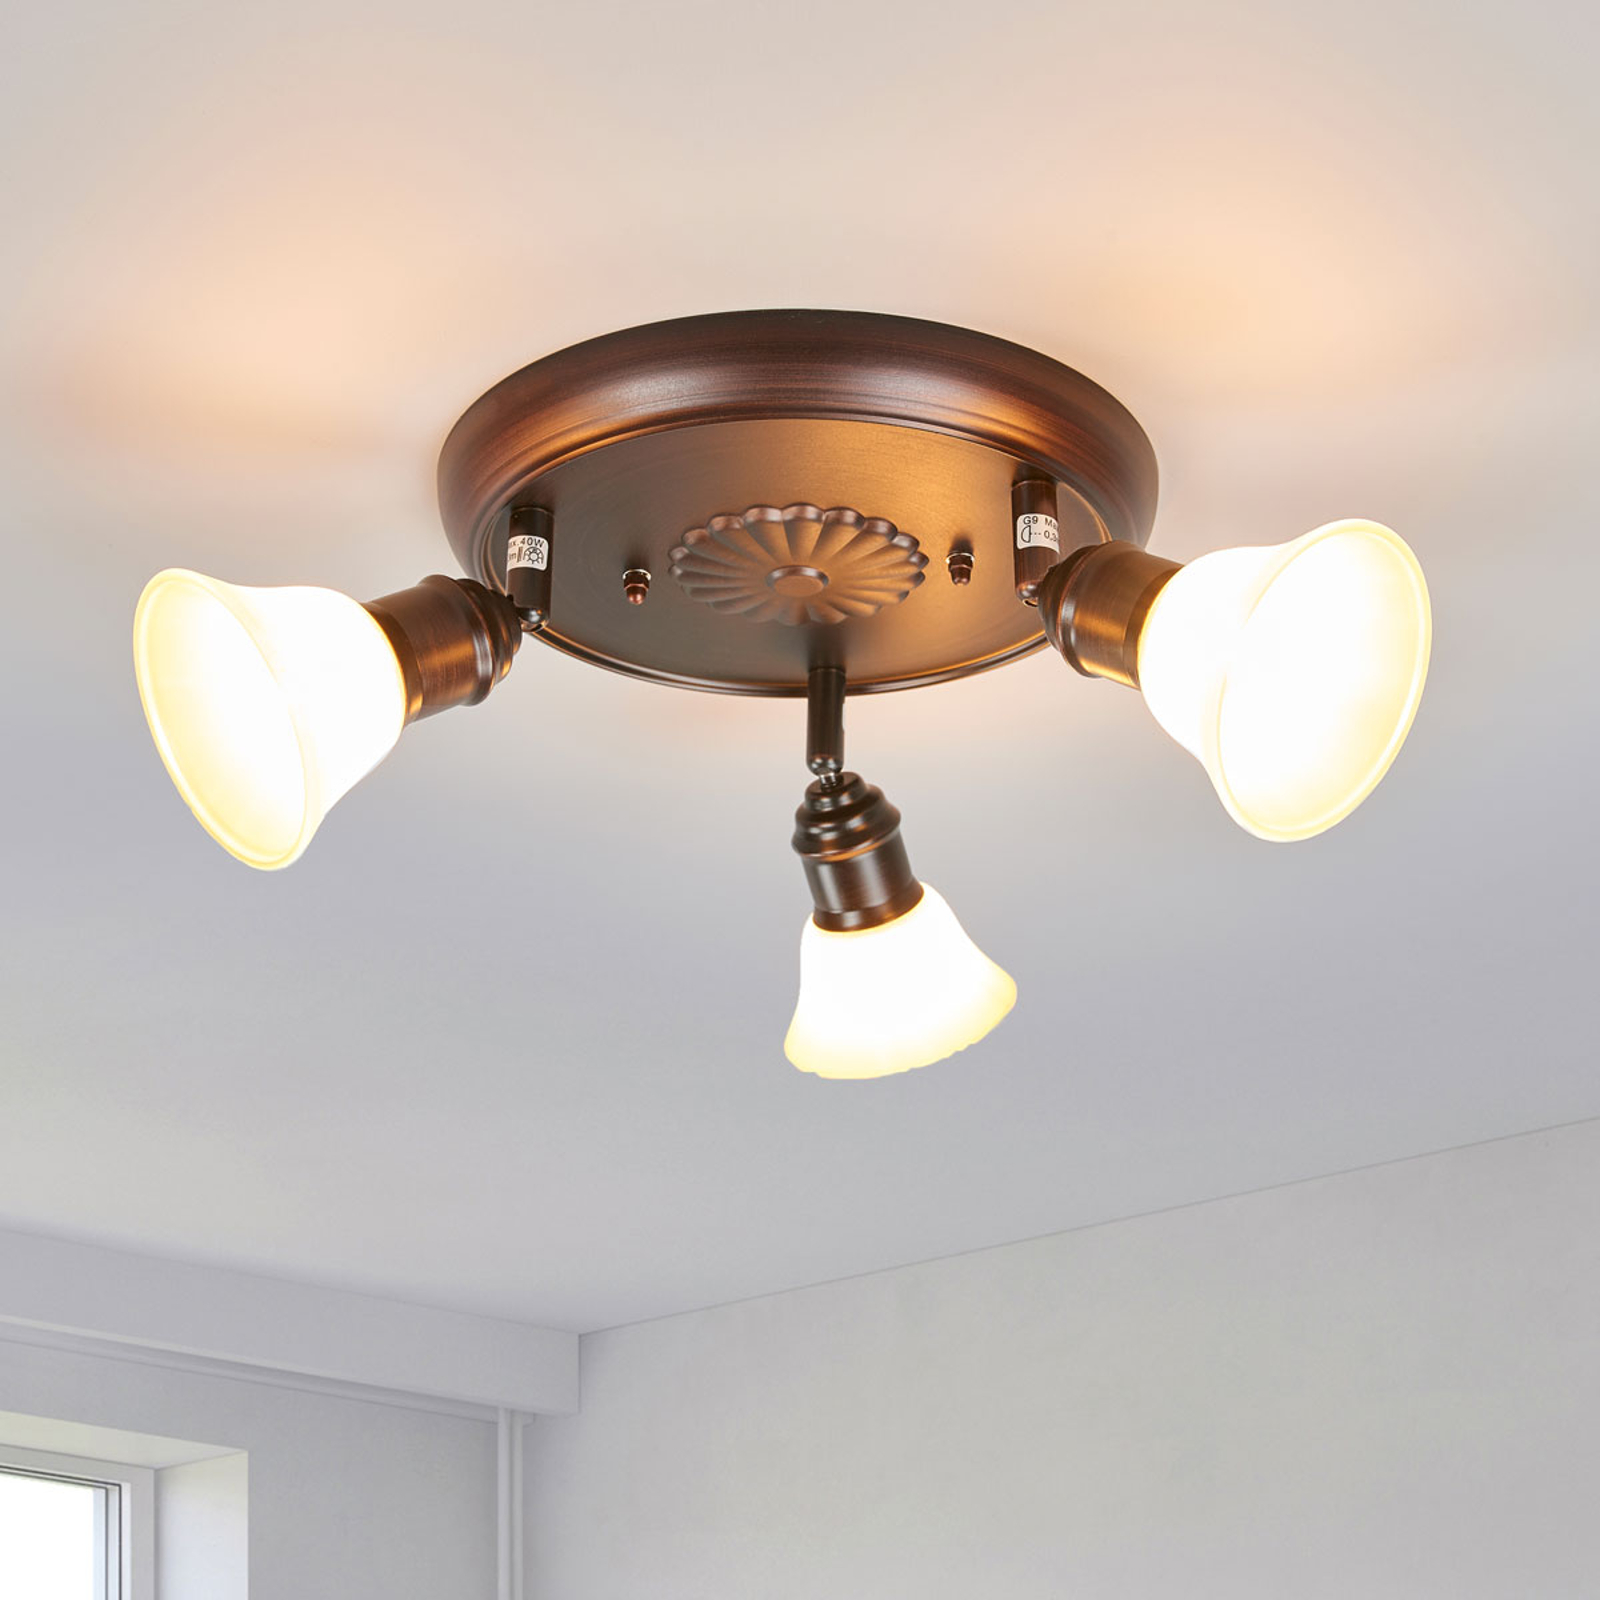 Rustieke plafondlamp Elma